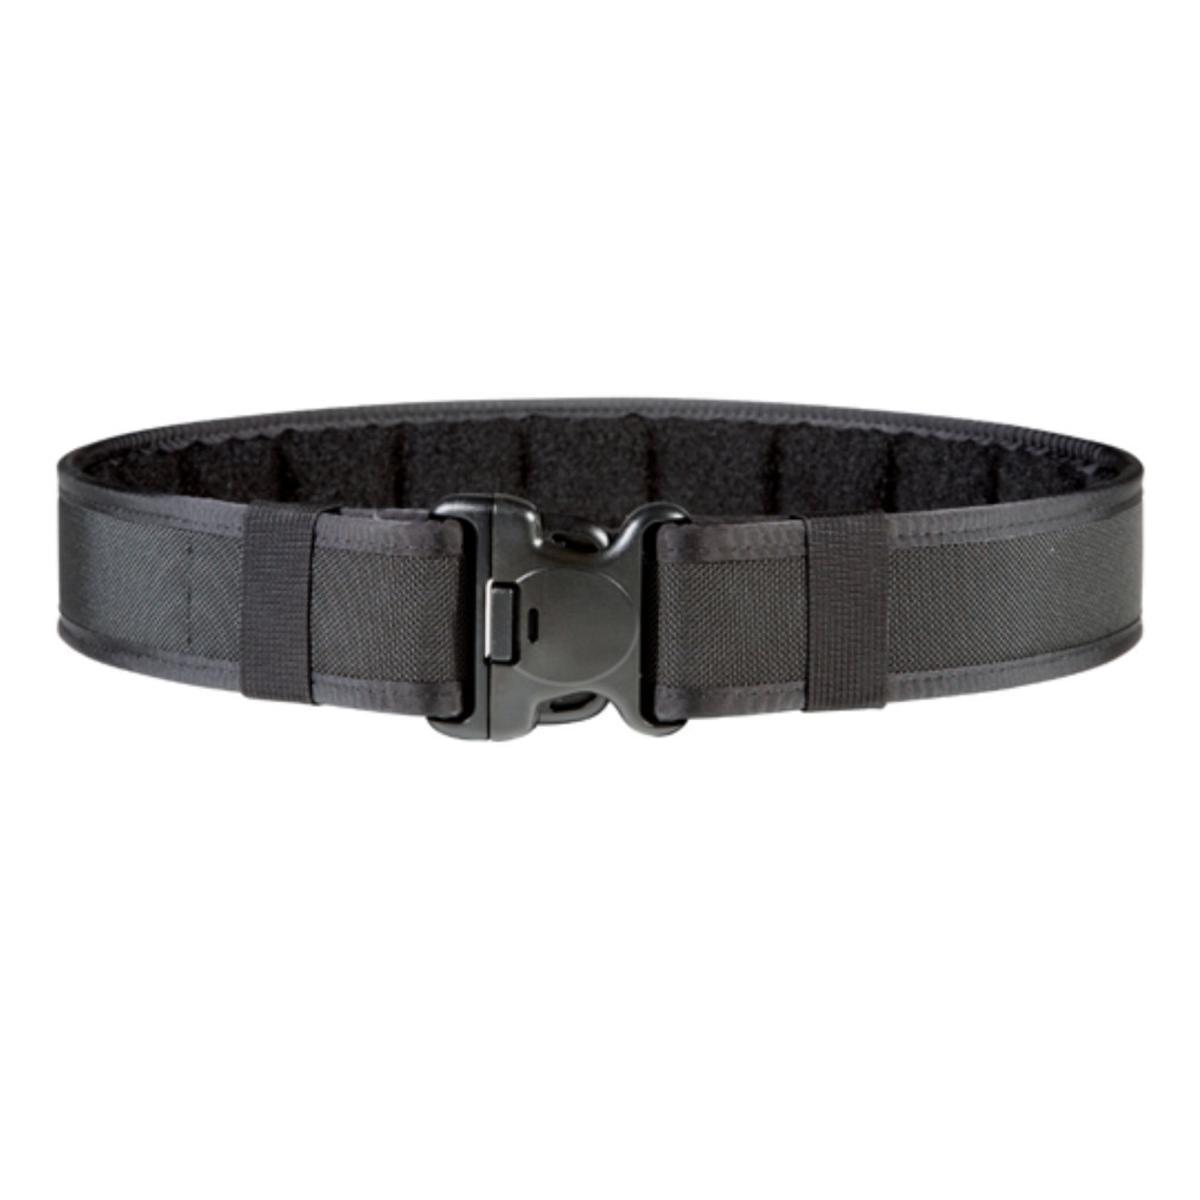 Bianchi 31329 8105 AccuMold Nylon PatrolTek Inner Duty Belt Liner M L XL